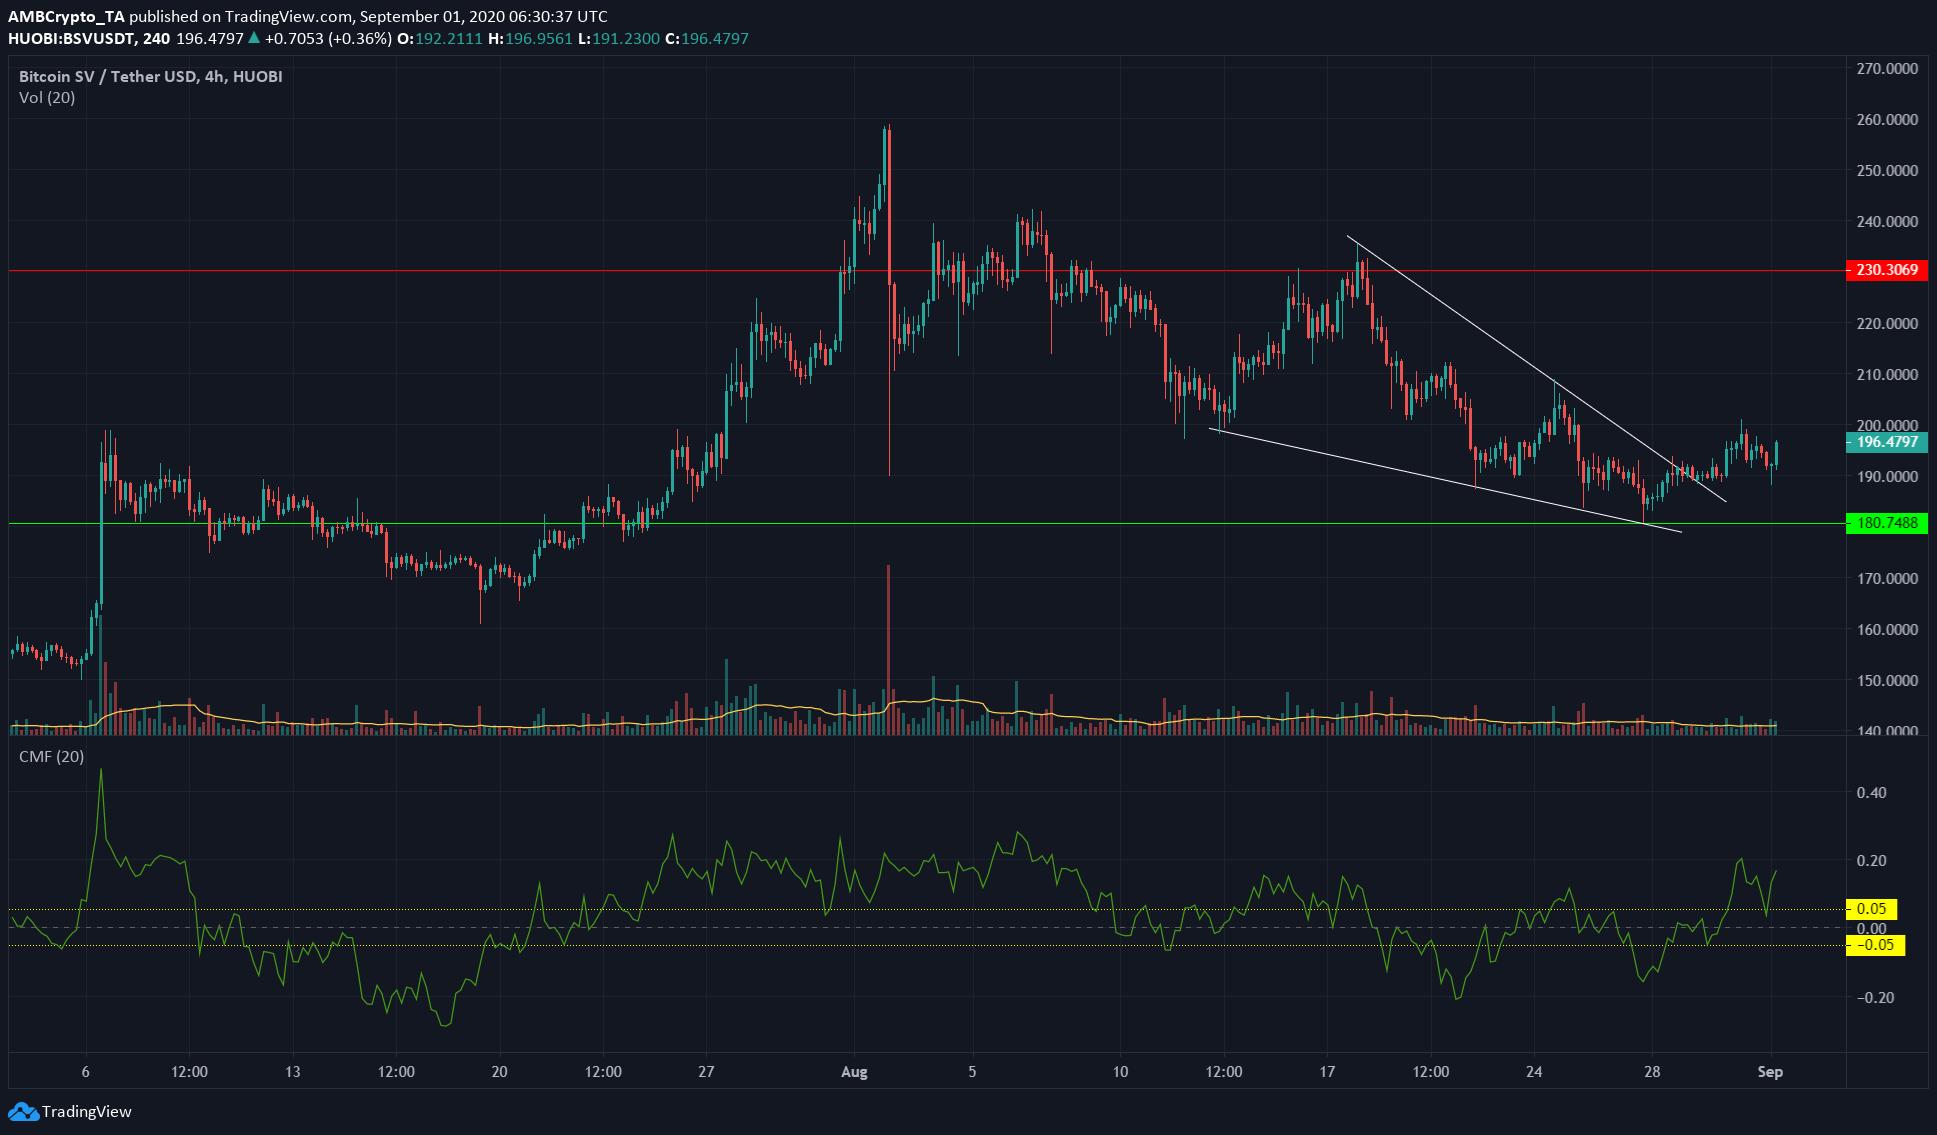 Bitcoin SV, Ontology, FTX Token Price Analysis: 1 September